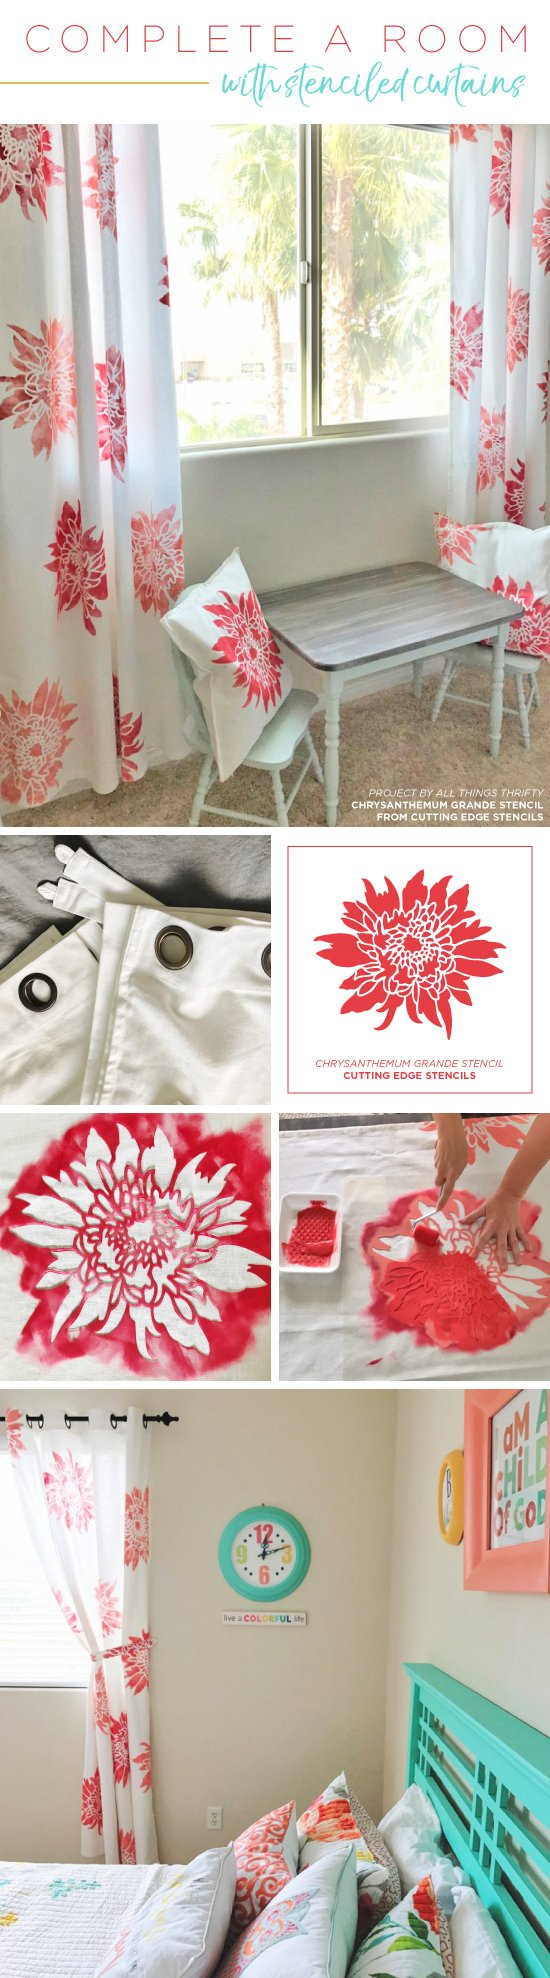 Cutting Edge Stencils shares how to customize plain white curtain panels using chalk paint and a flower stencil pattern. http://www.cuttingedgestencils.com/flower-stencil-4.html